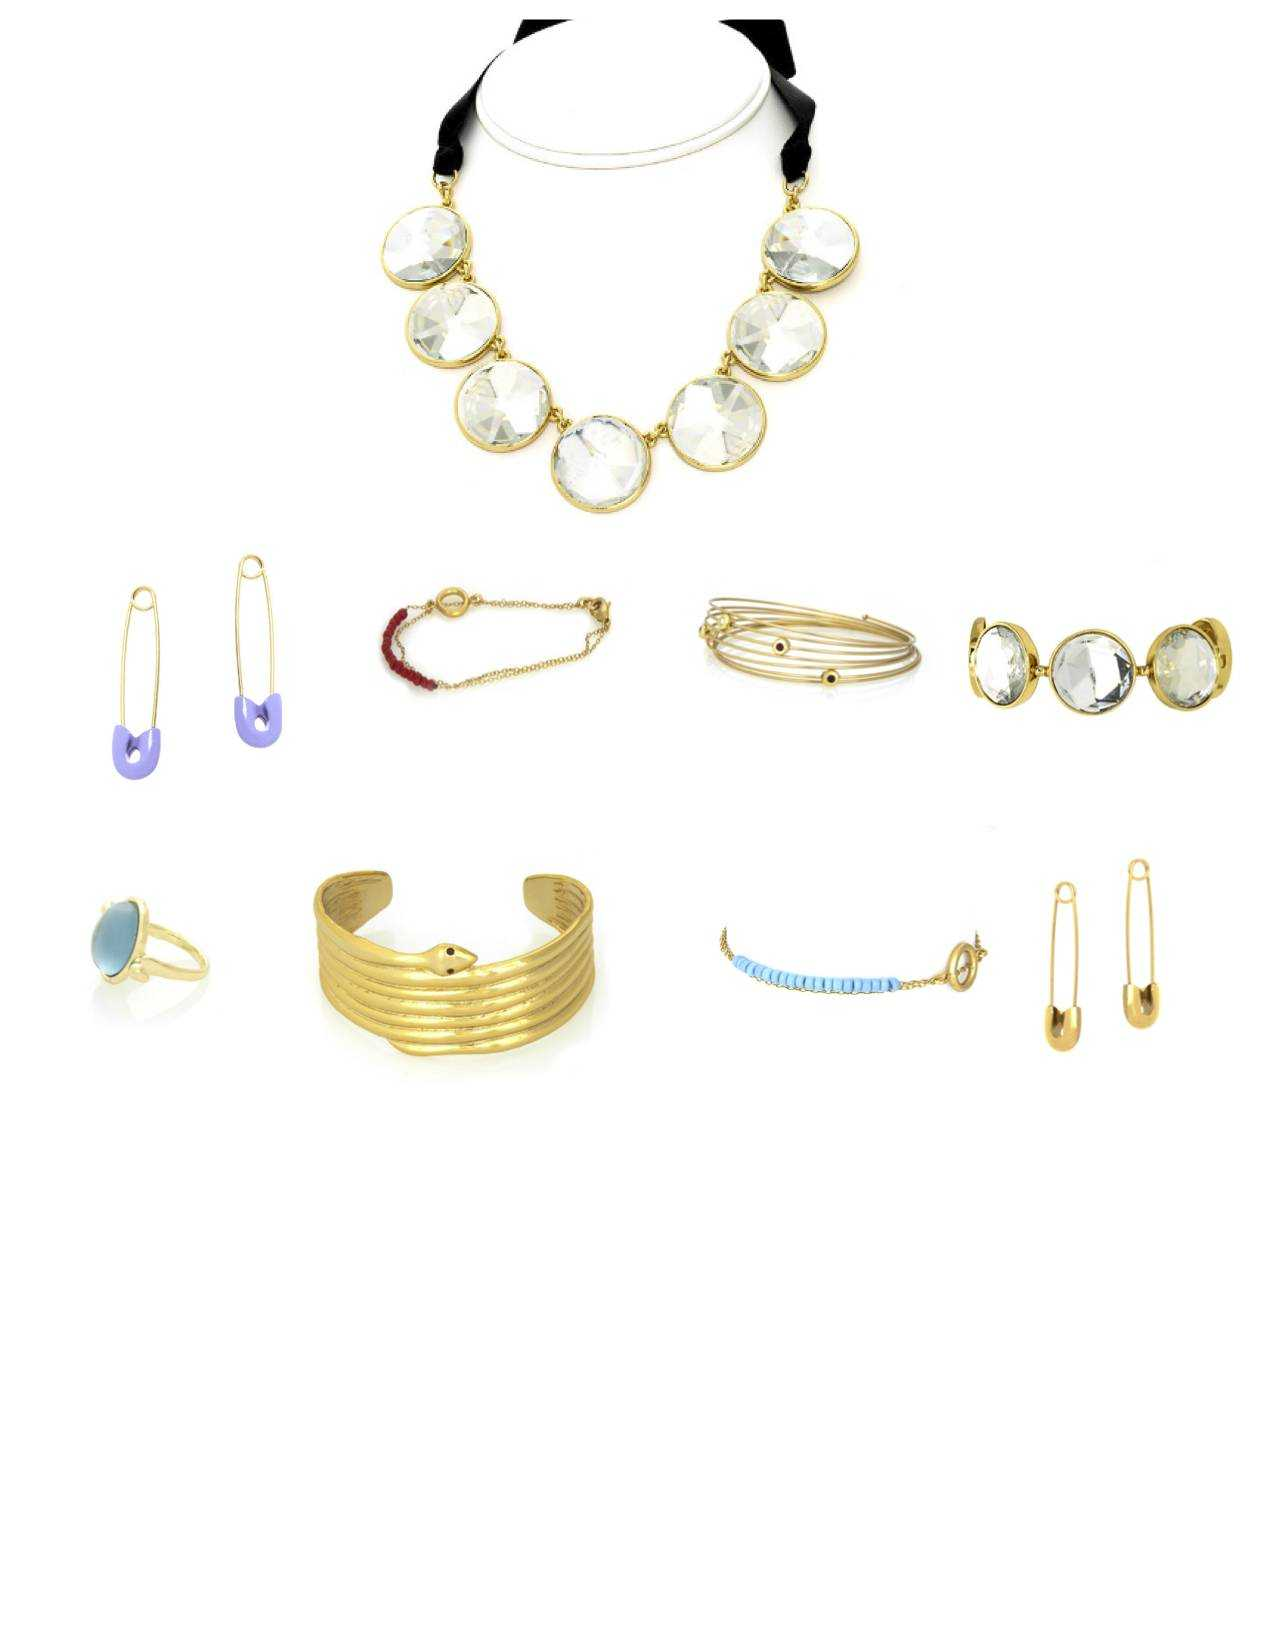 First Look: Kristin Cavallari Introduces New Jewelry Line ...